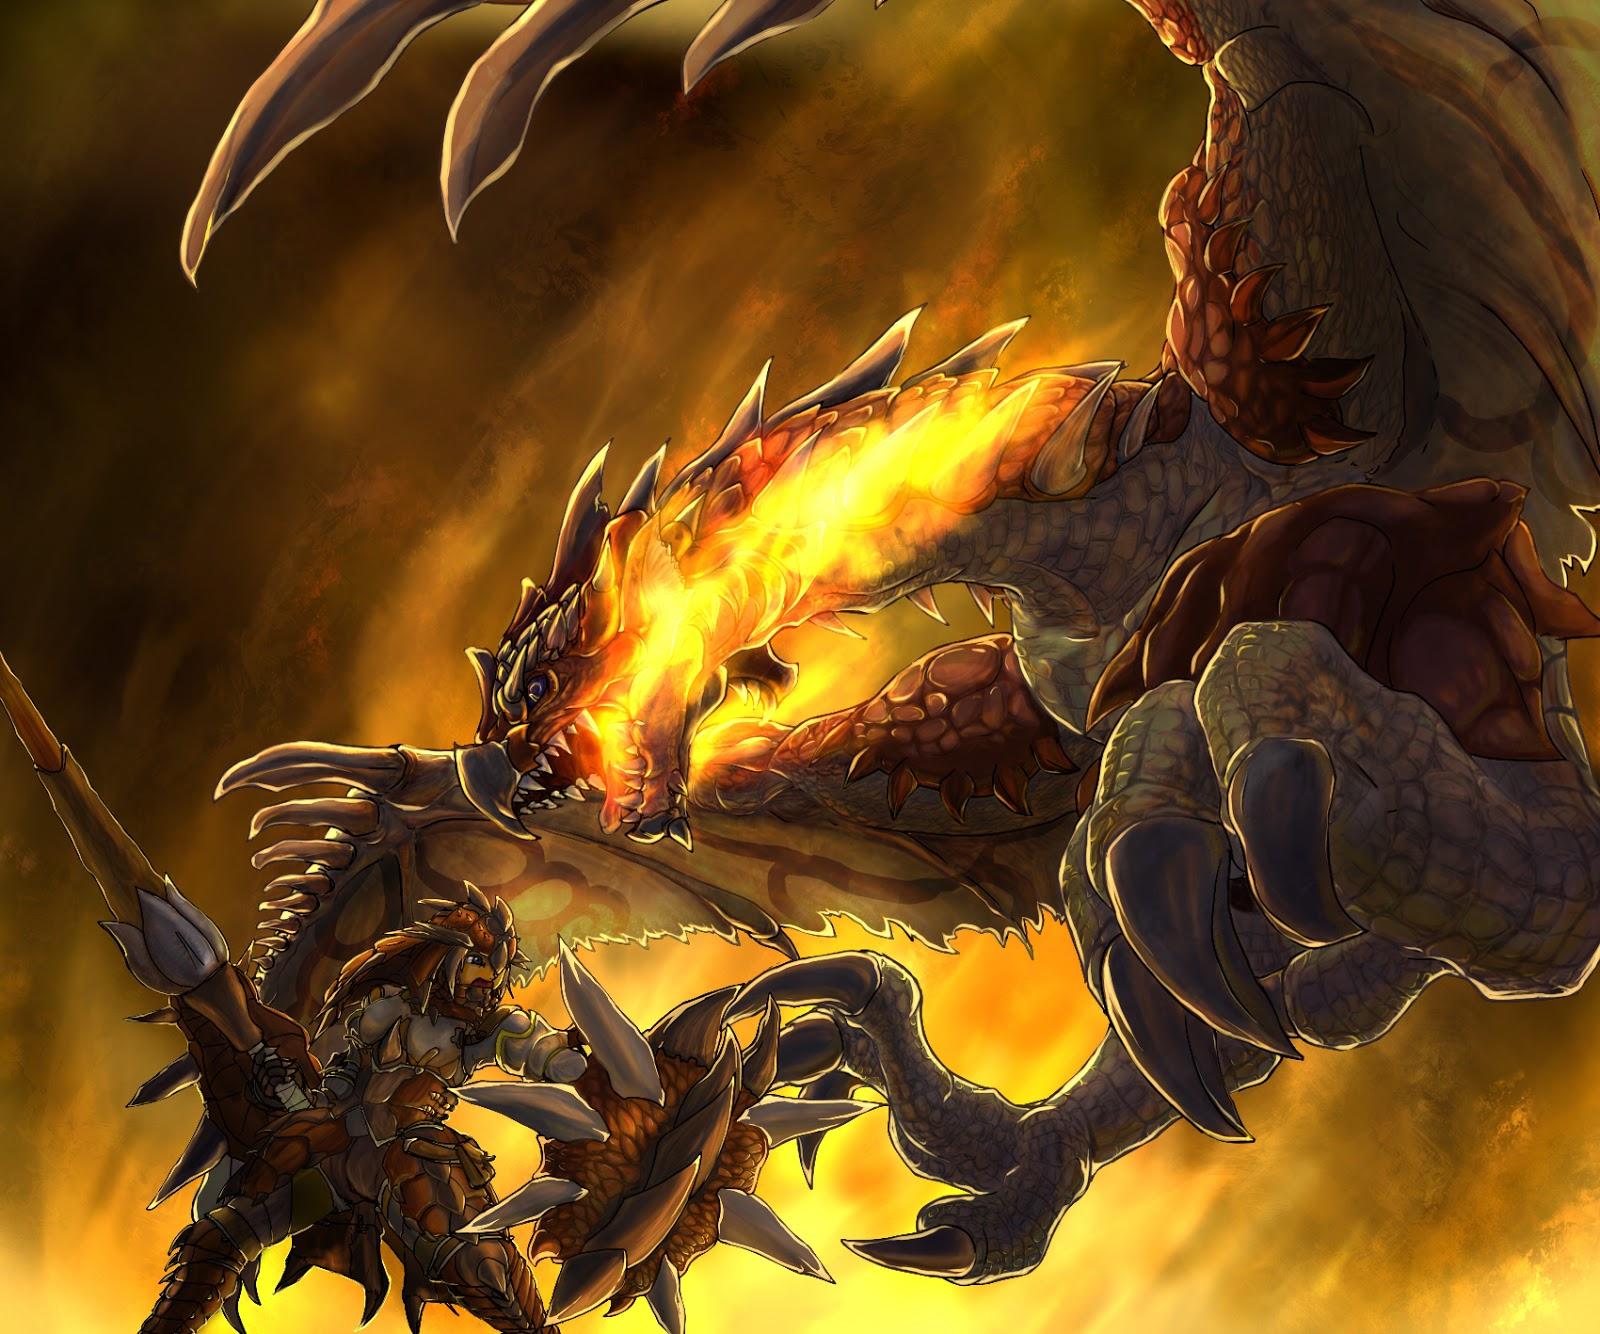 Wallpaper Desktop: Dragon Wallpaper